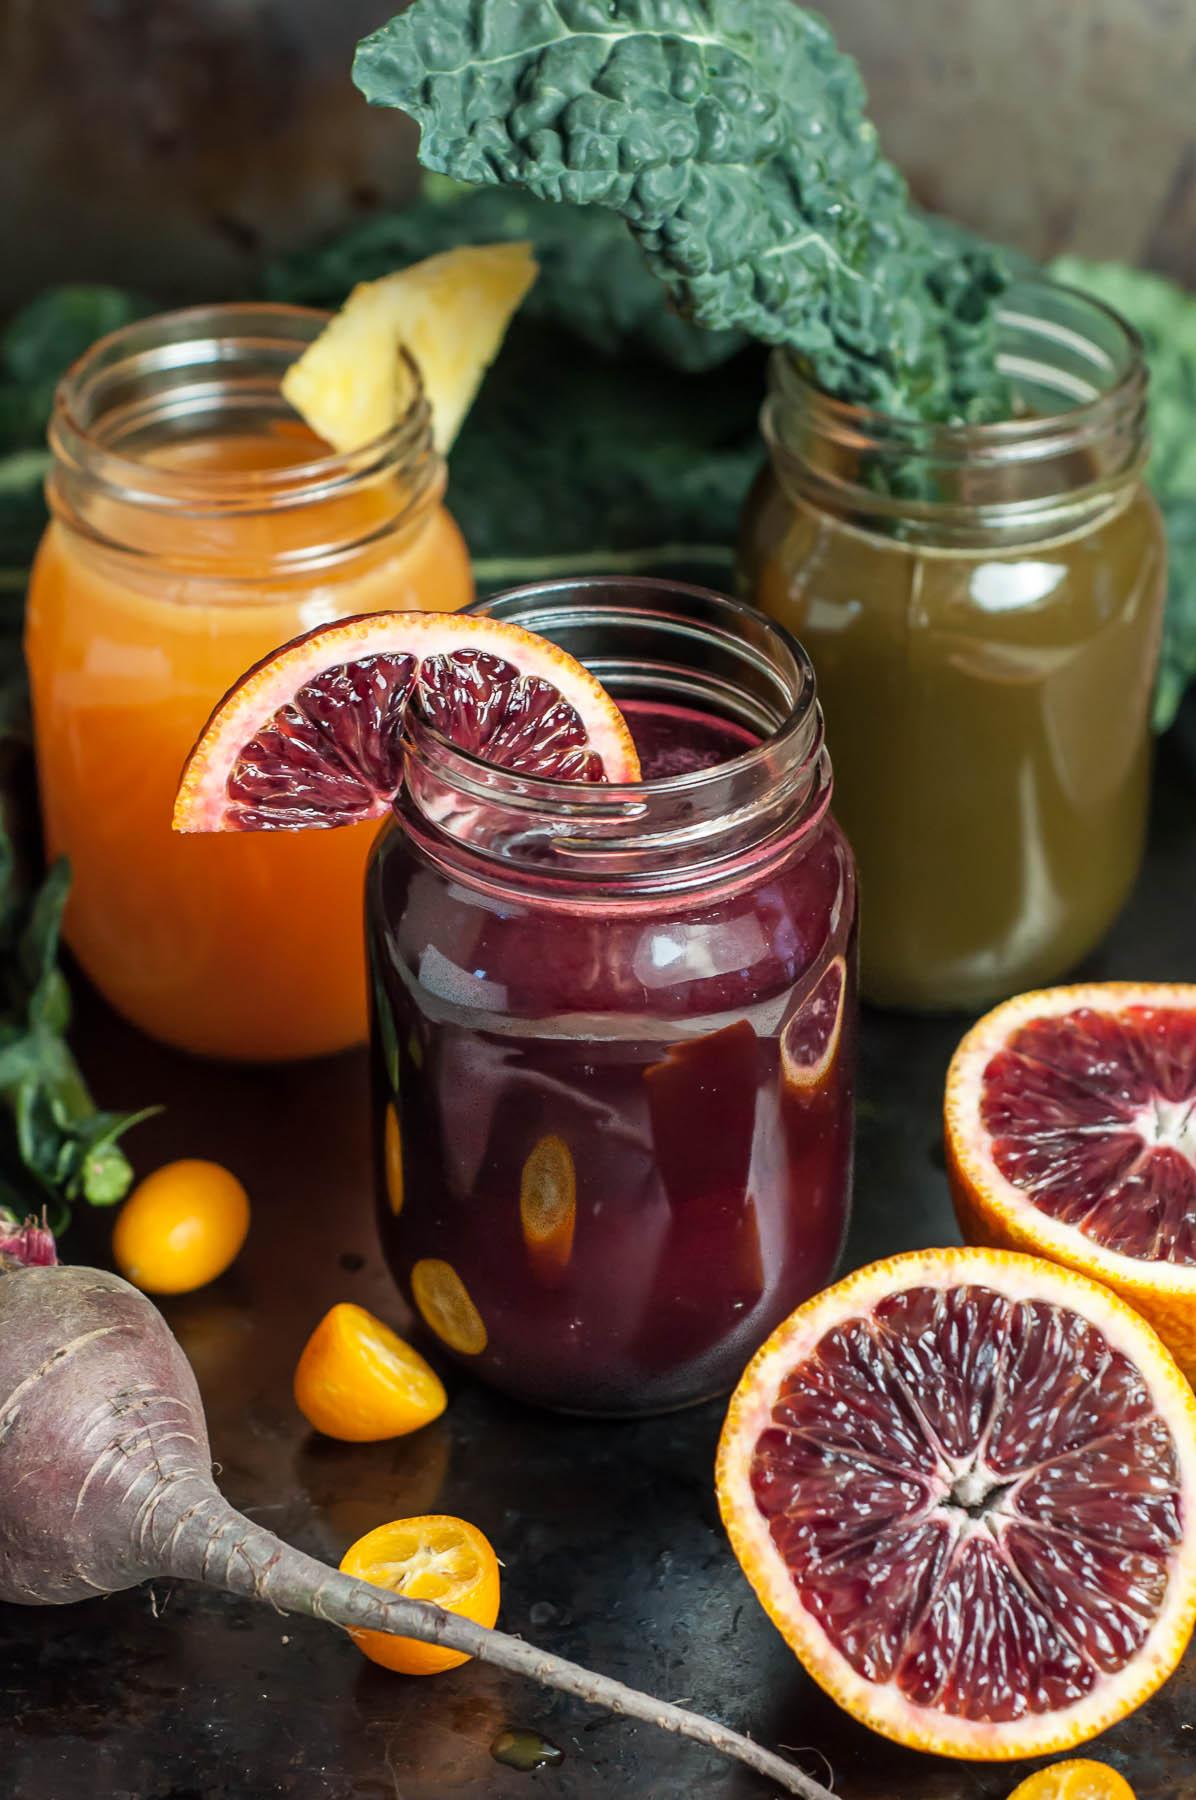 Homemade Winter Juices